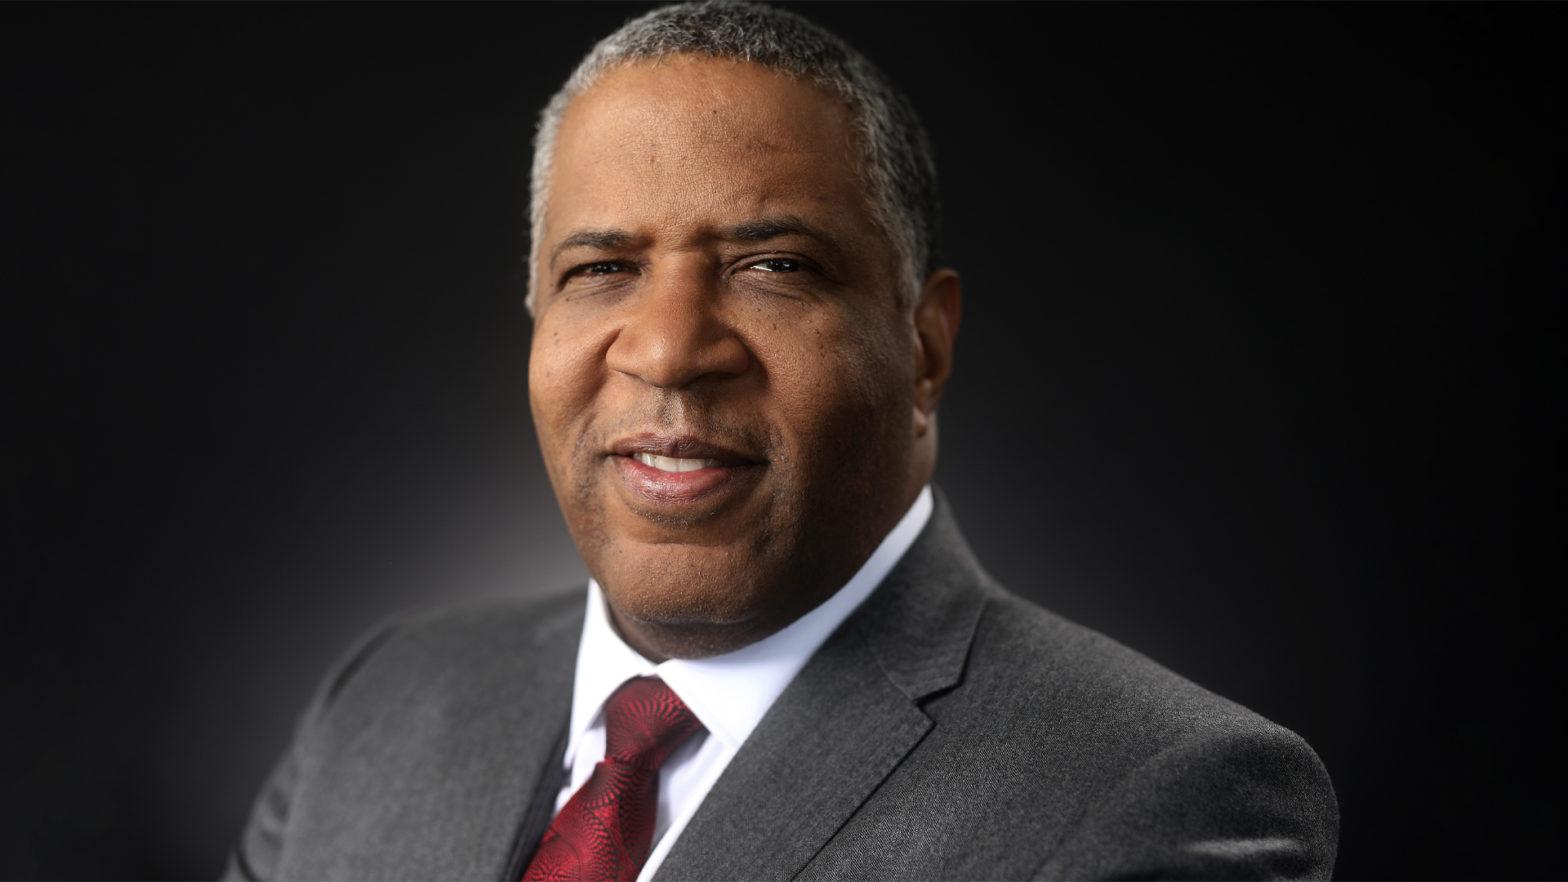 Meet Robert F. Smith, A Philanthropist, HBCU Advocate And The Wealthiest Black Man In America